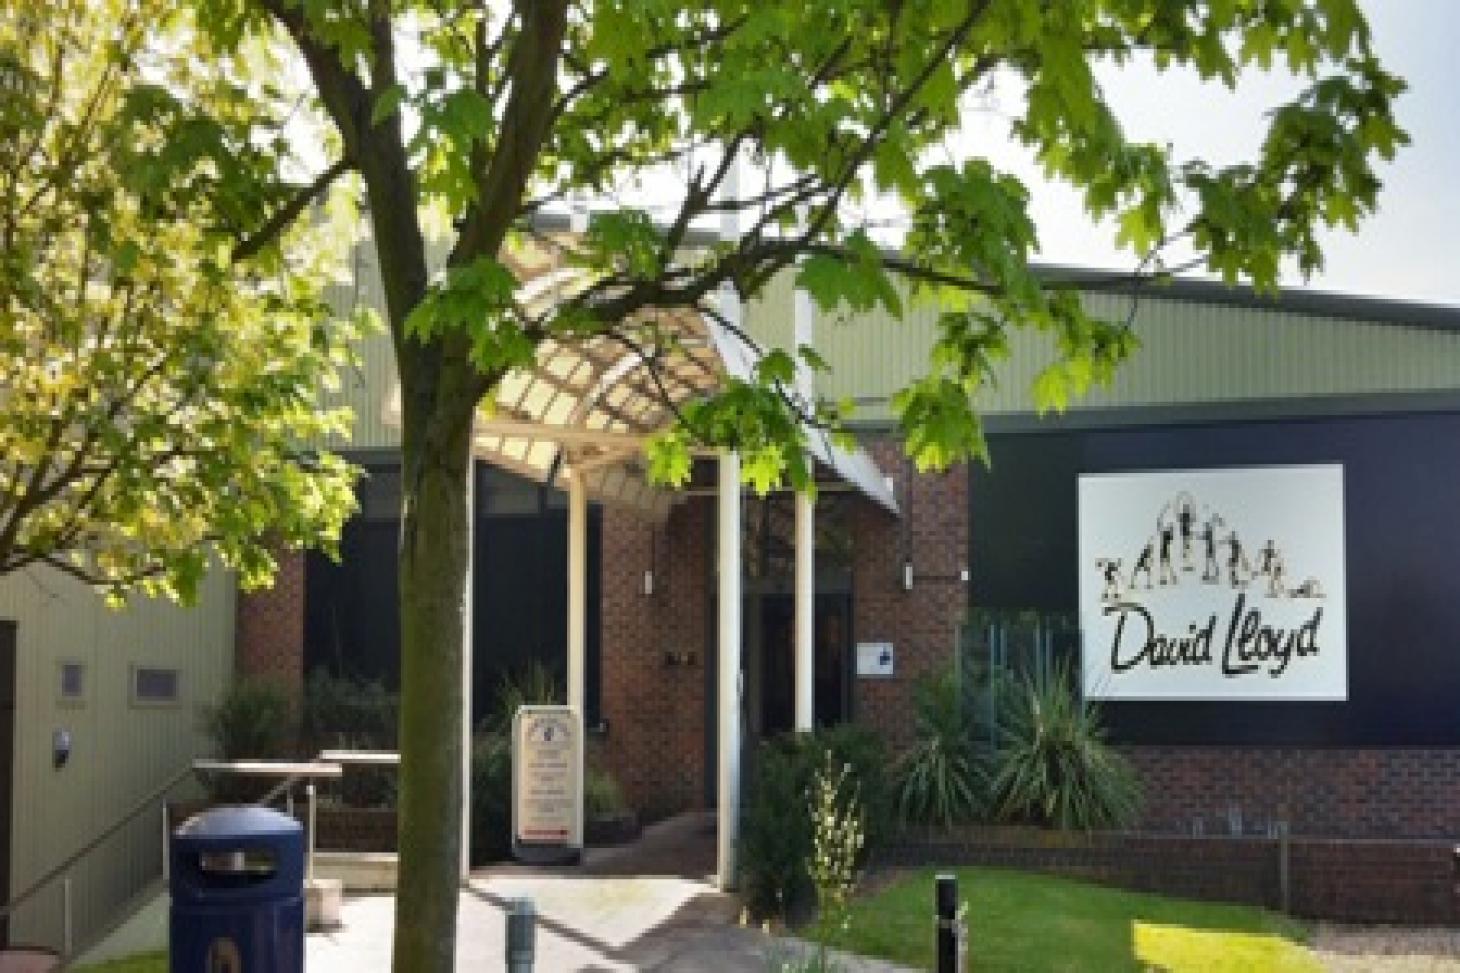 David Lloyds Raynes Park Outdoor | Clay tennis court